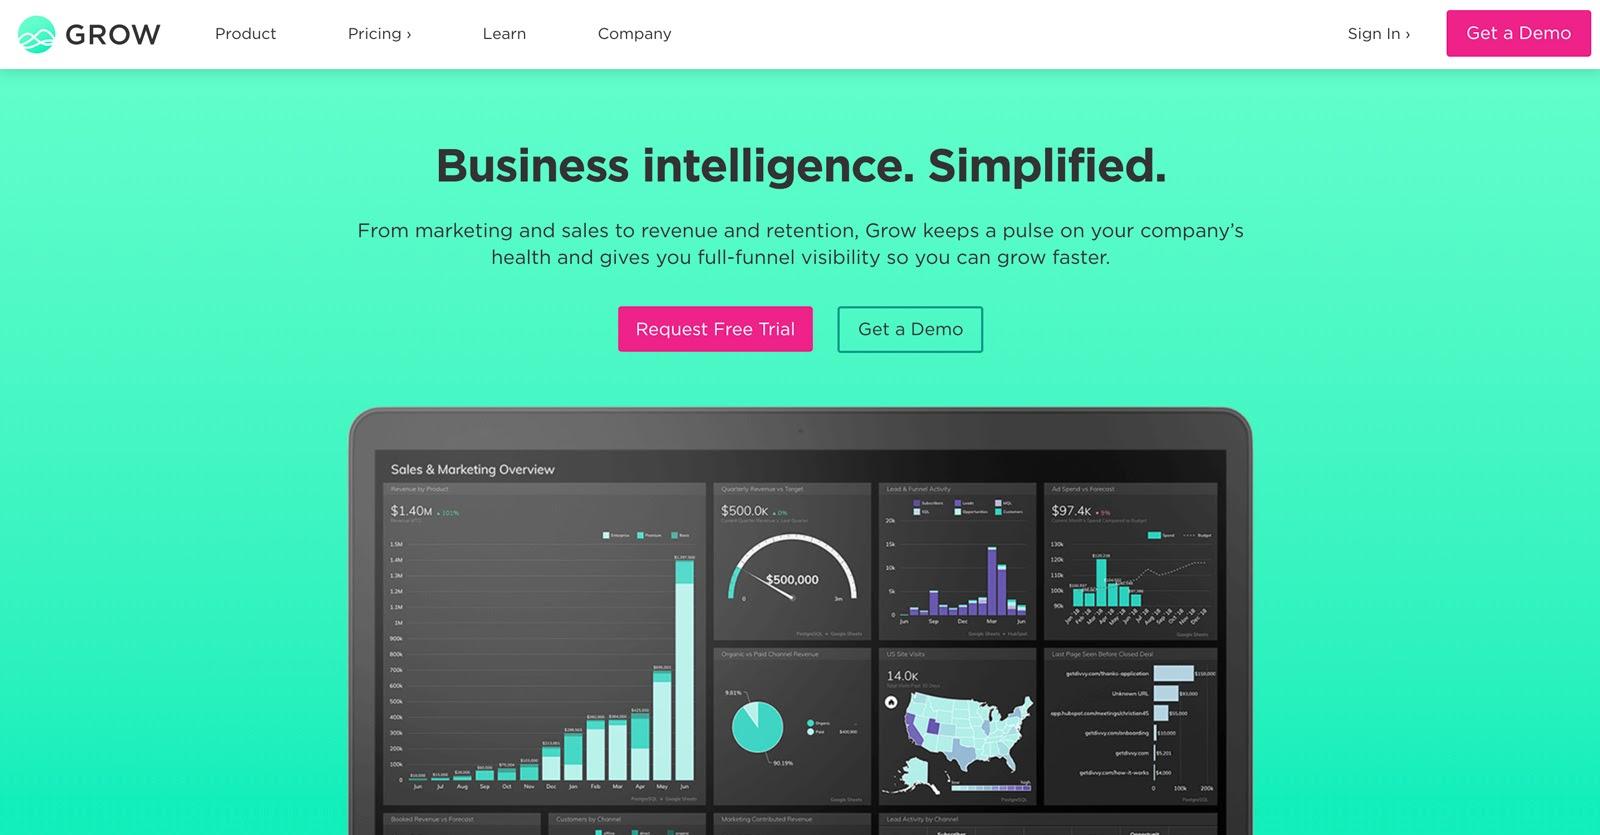 grow business intelligence